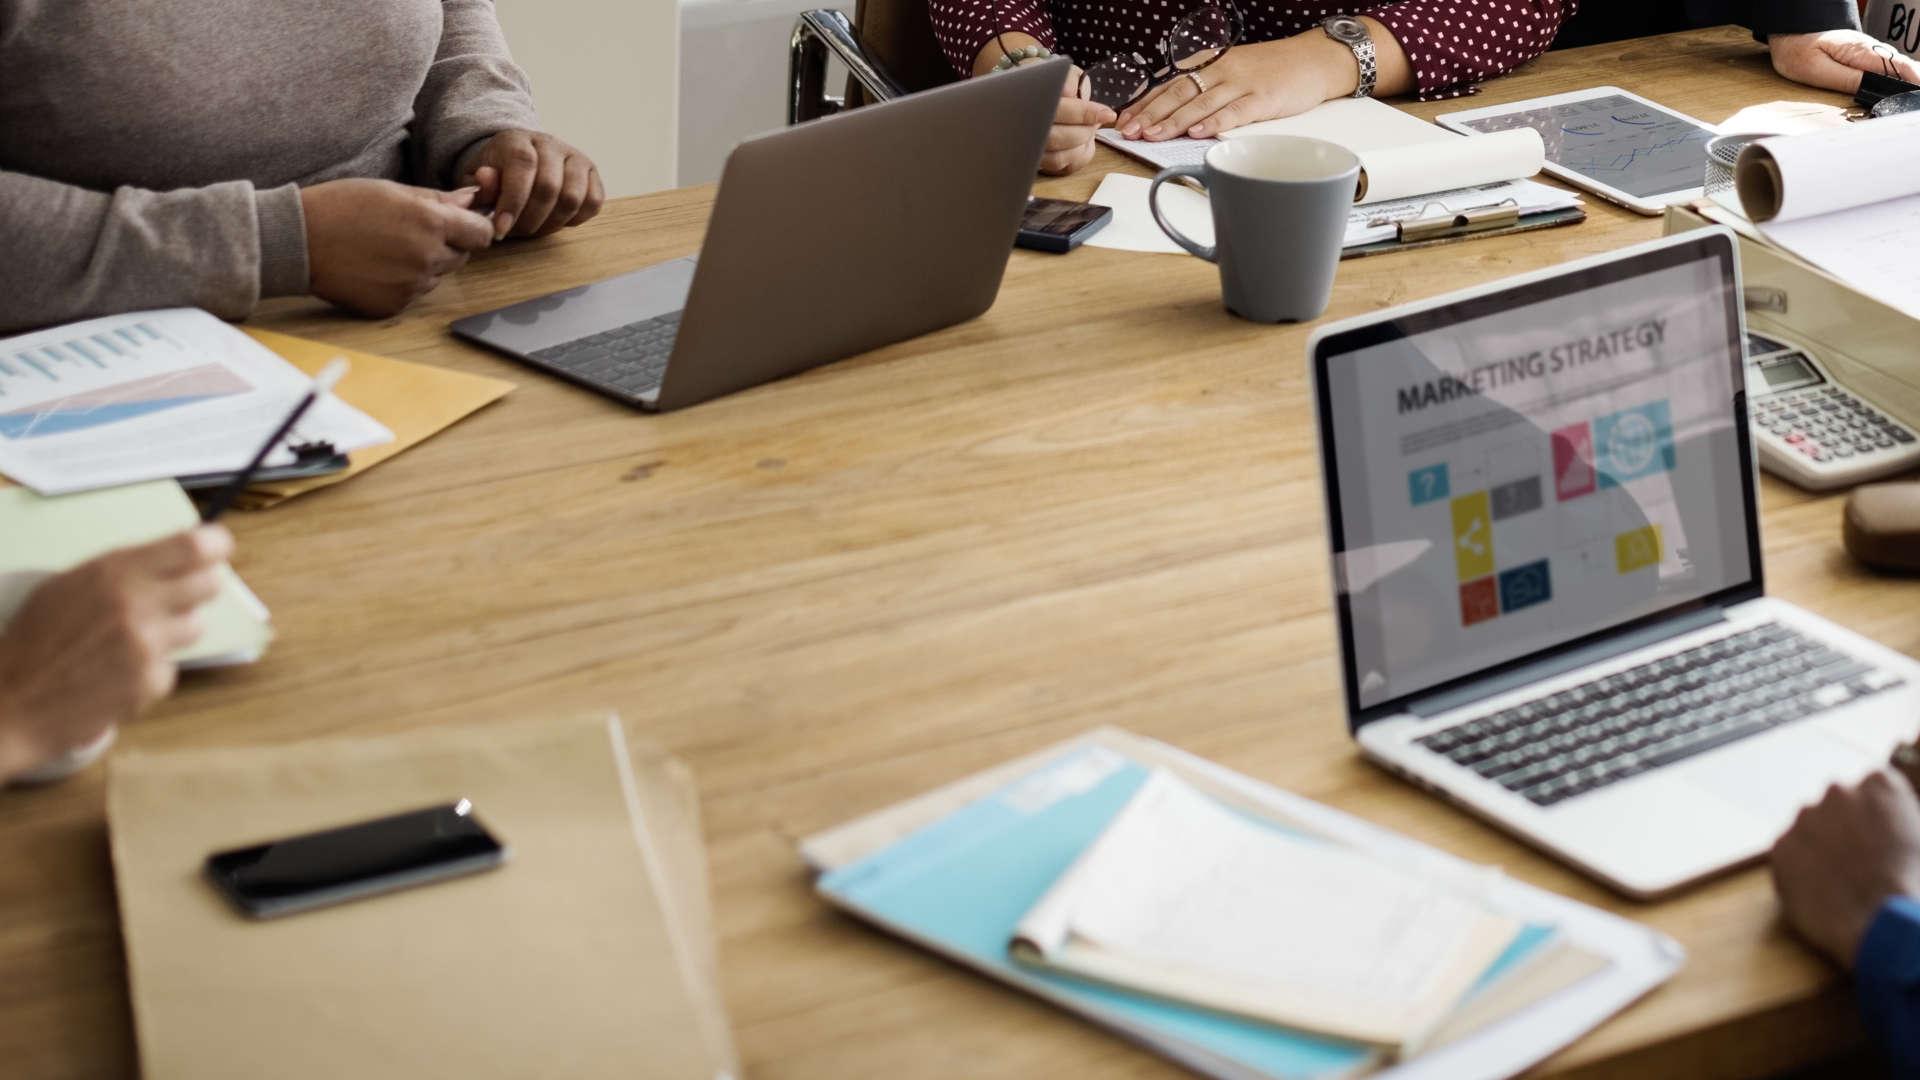 Brand guidelines, designs for print, digital designs